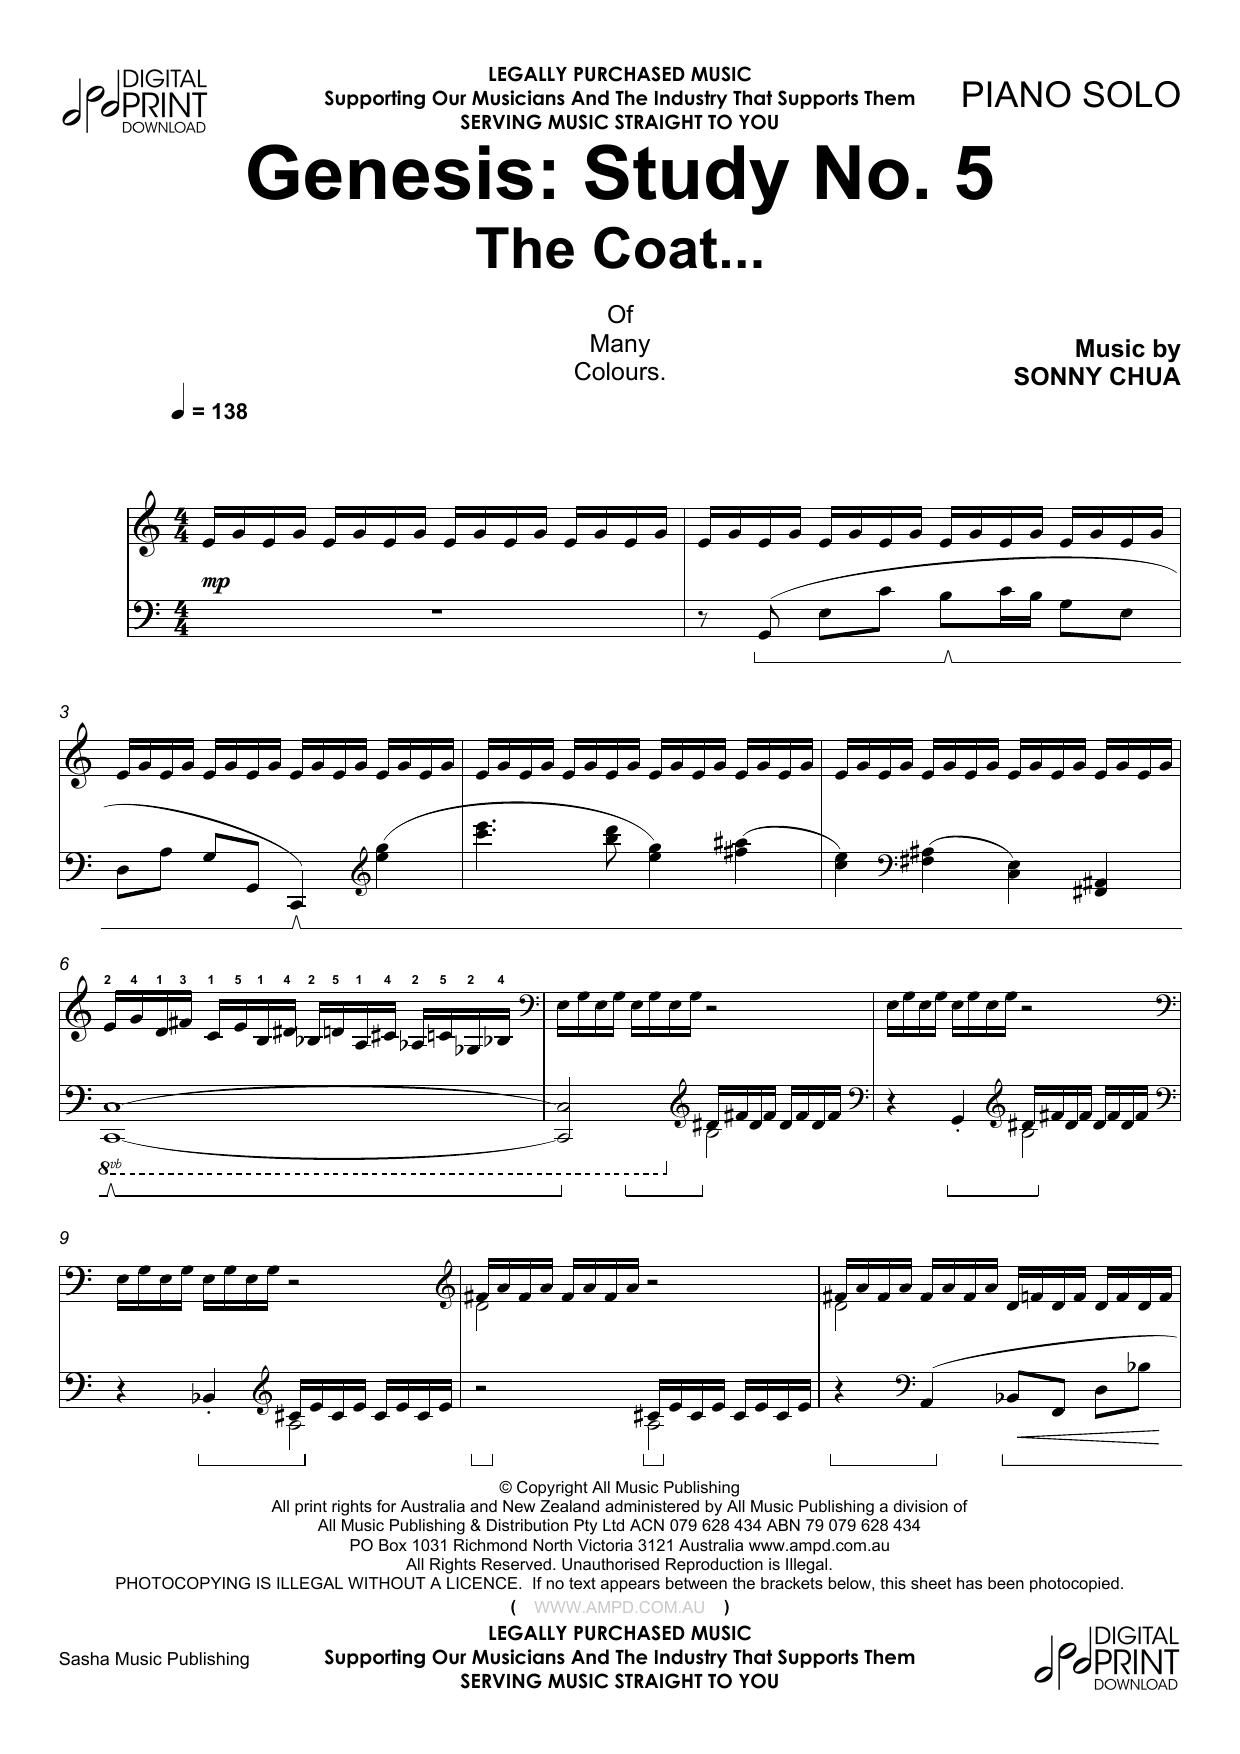 Genesis Study No 5 The Coat Sheet Music